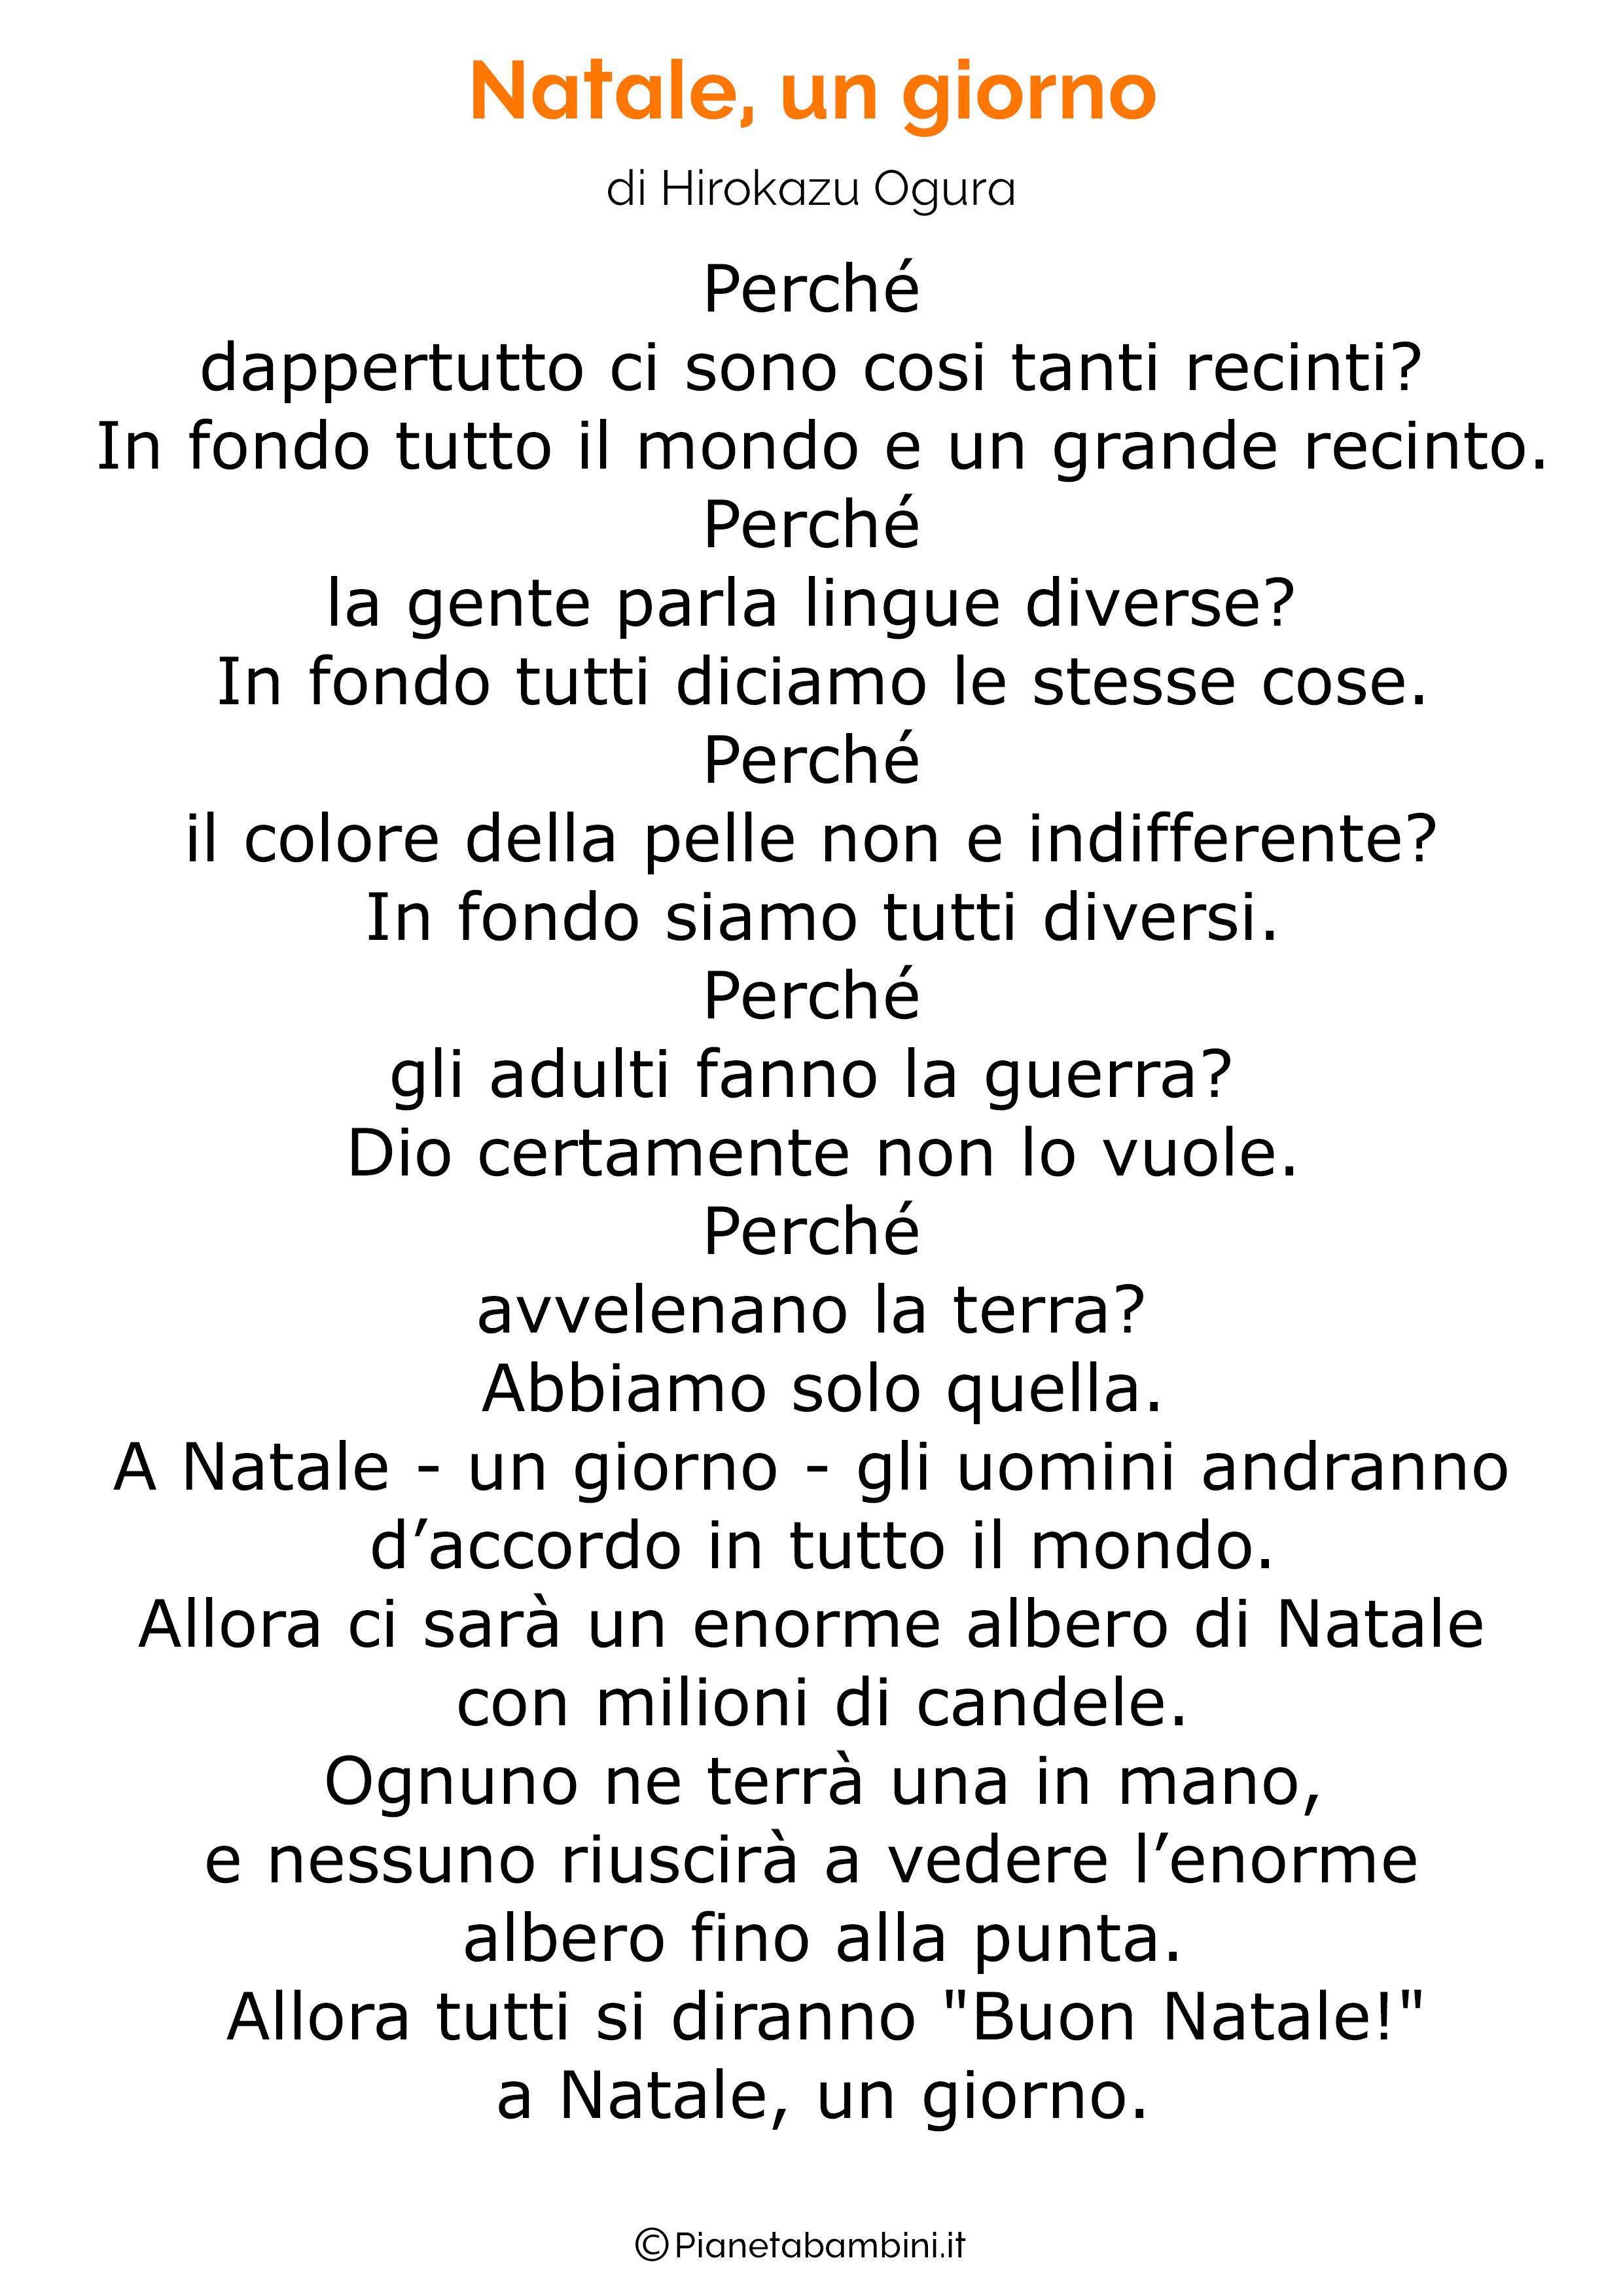 Poesia di Natale autori classici 07